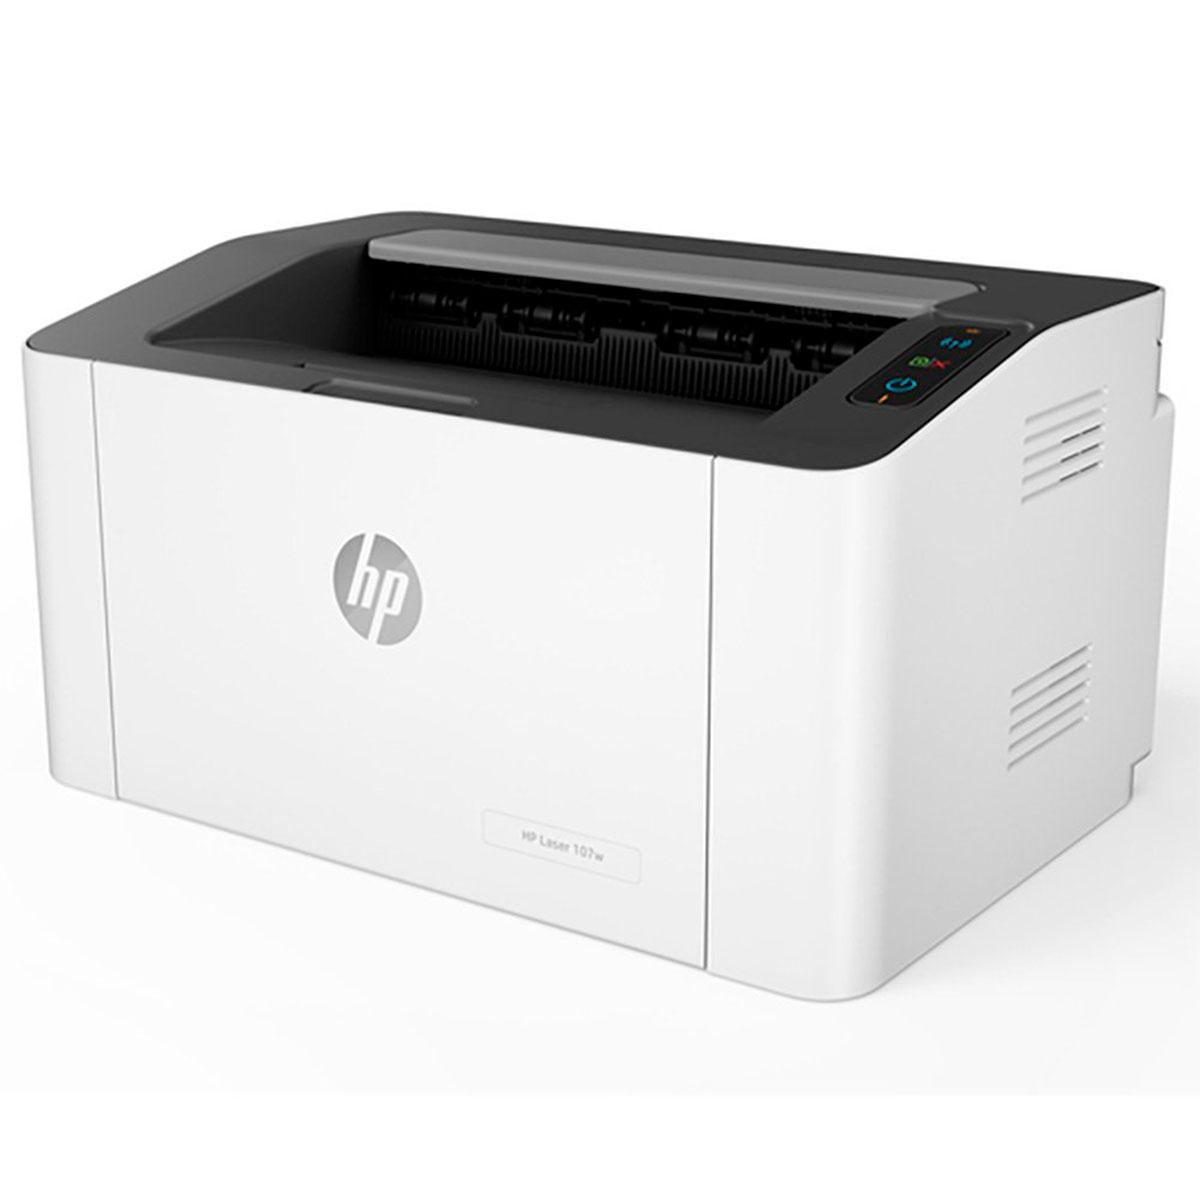 Impressora HP 107W, Laser, Monovolt 110V, Monocromática, Wi-Fi, Porta USB 2.0 - 4ZB78A - 110V